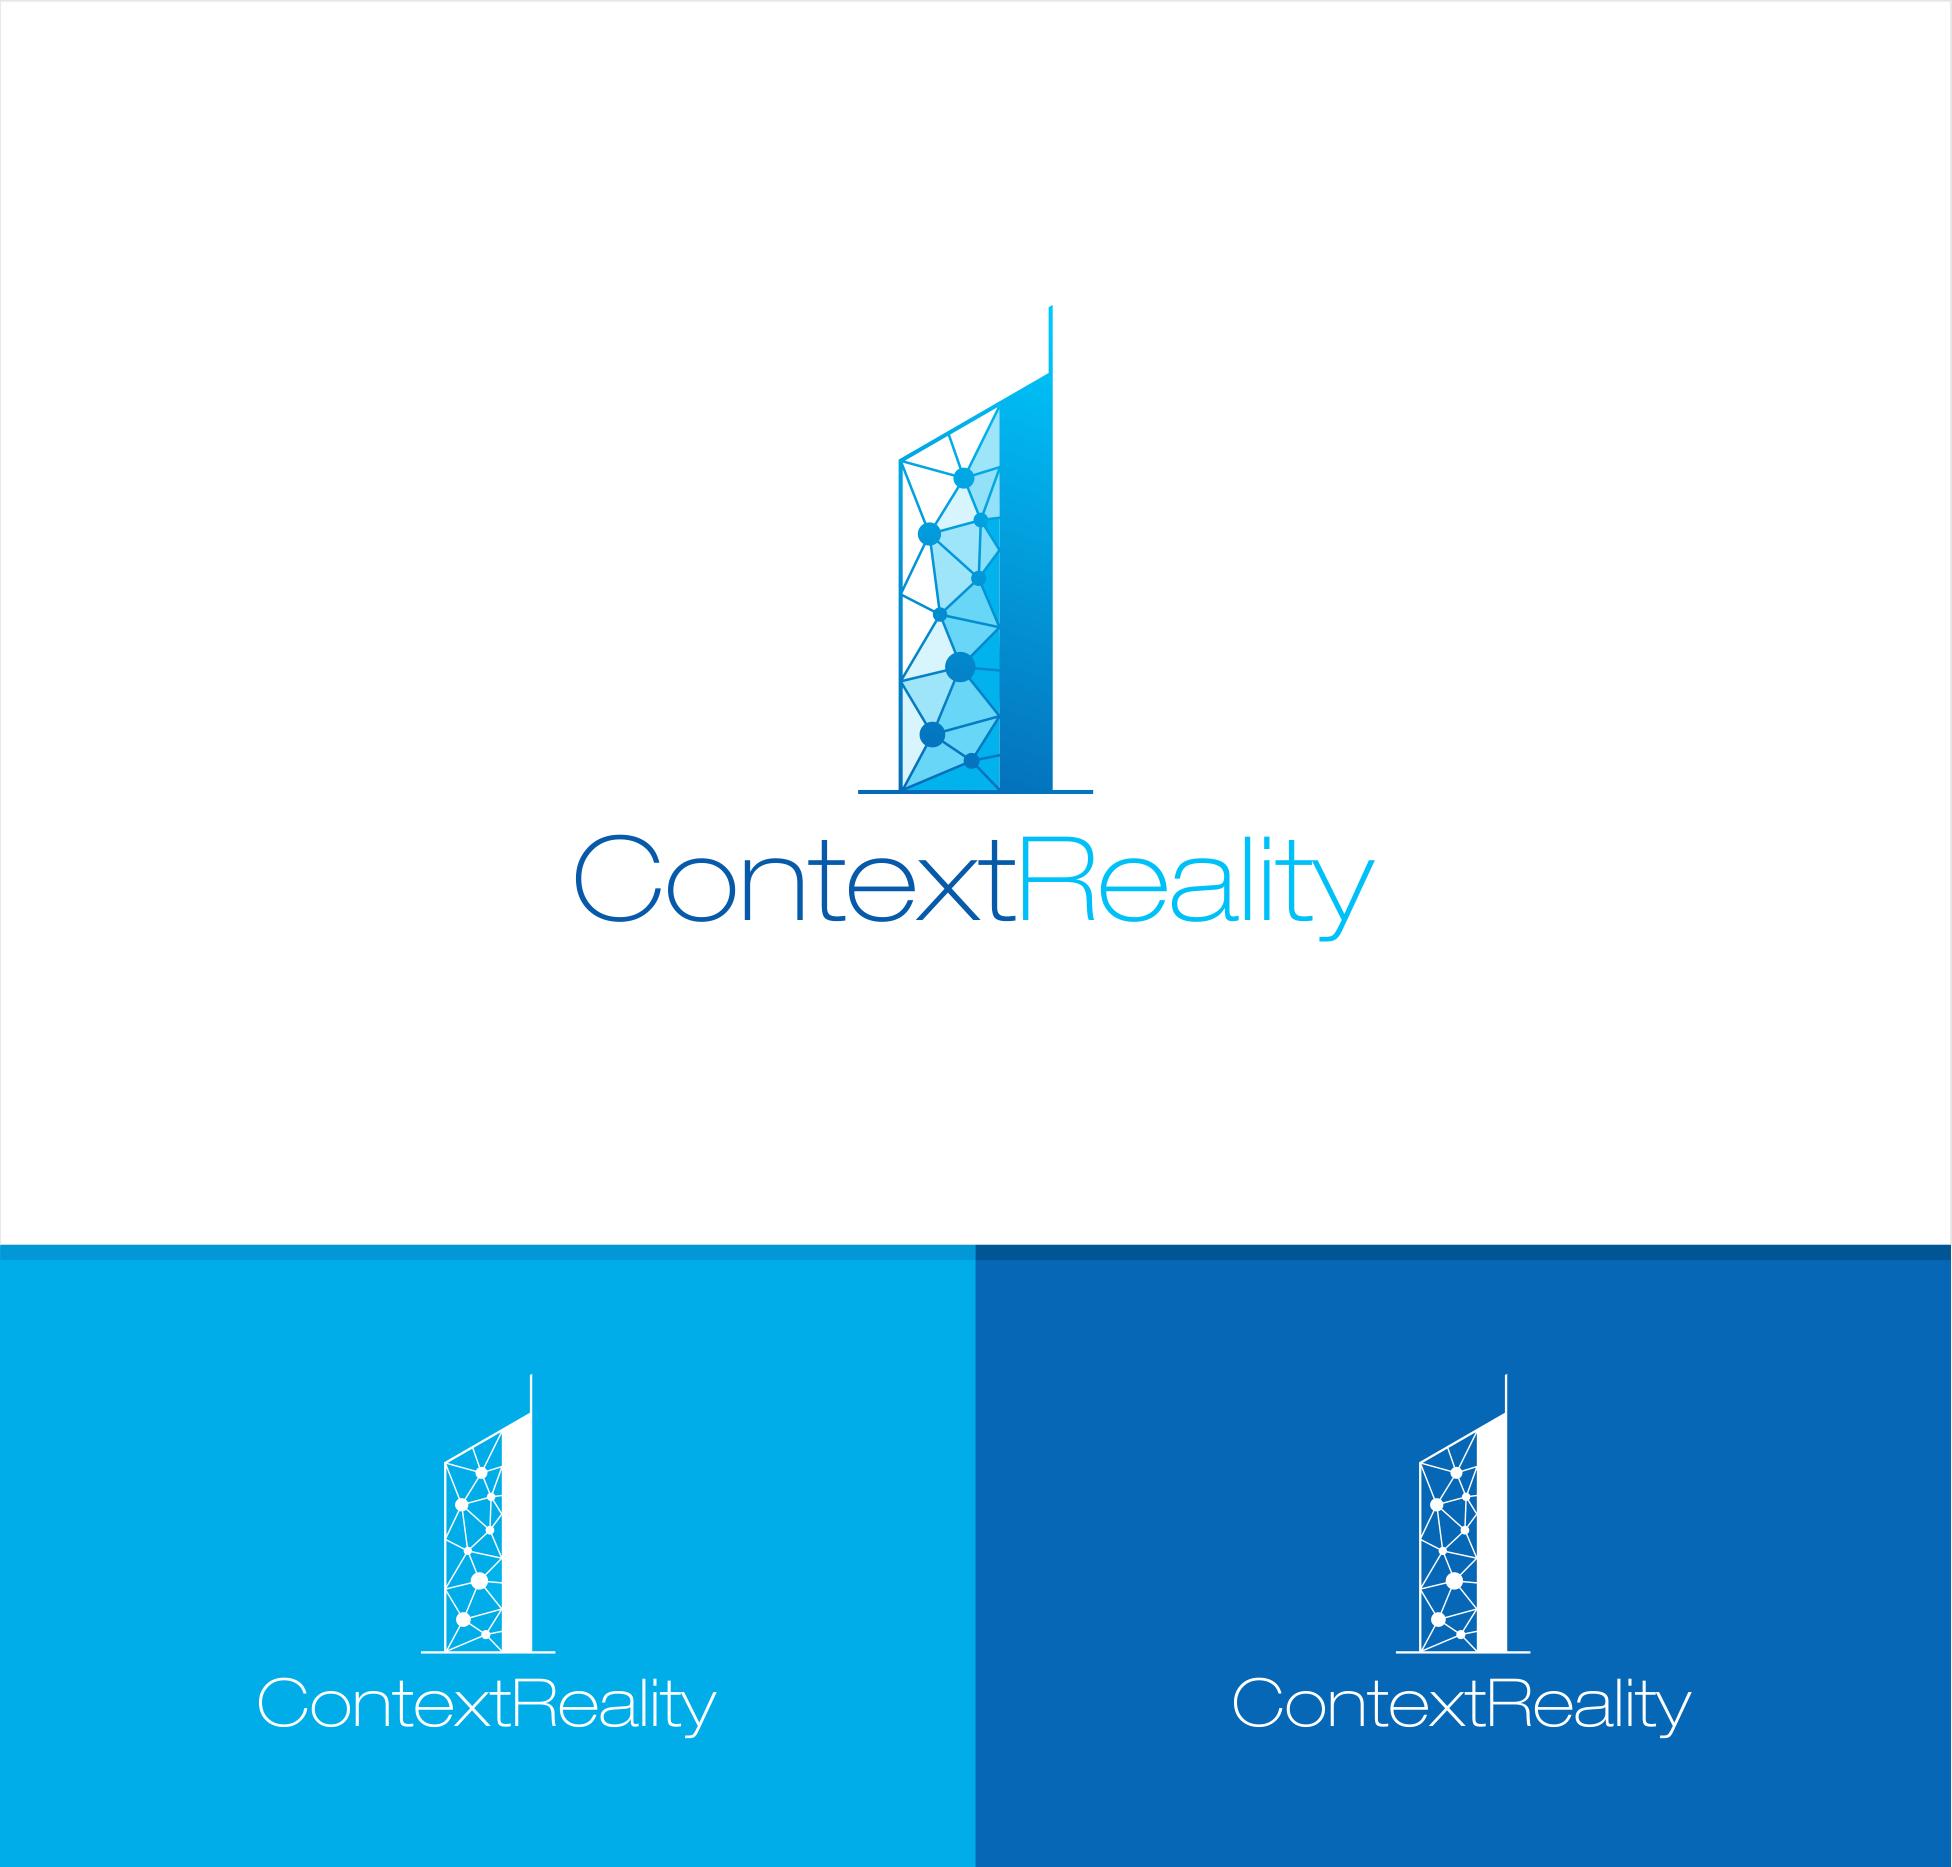 Context Reality needs a new modern logo